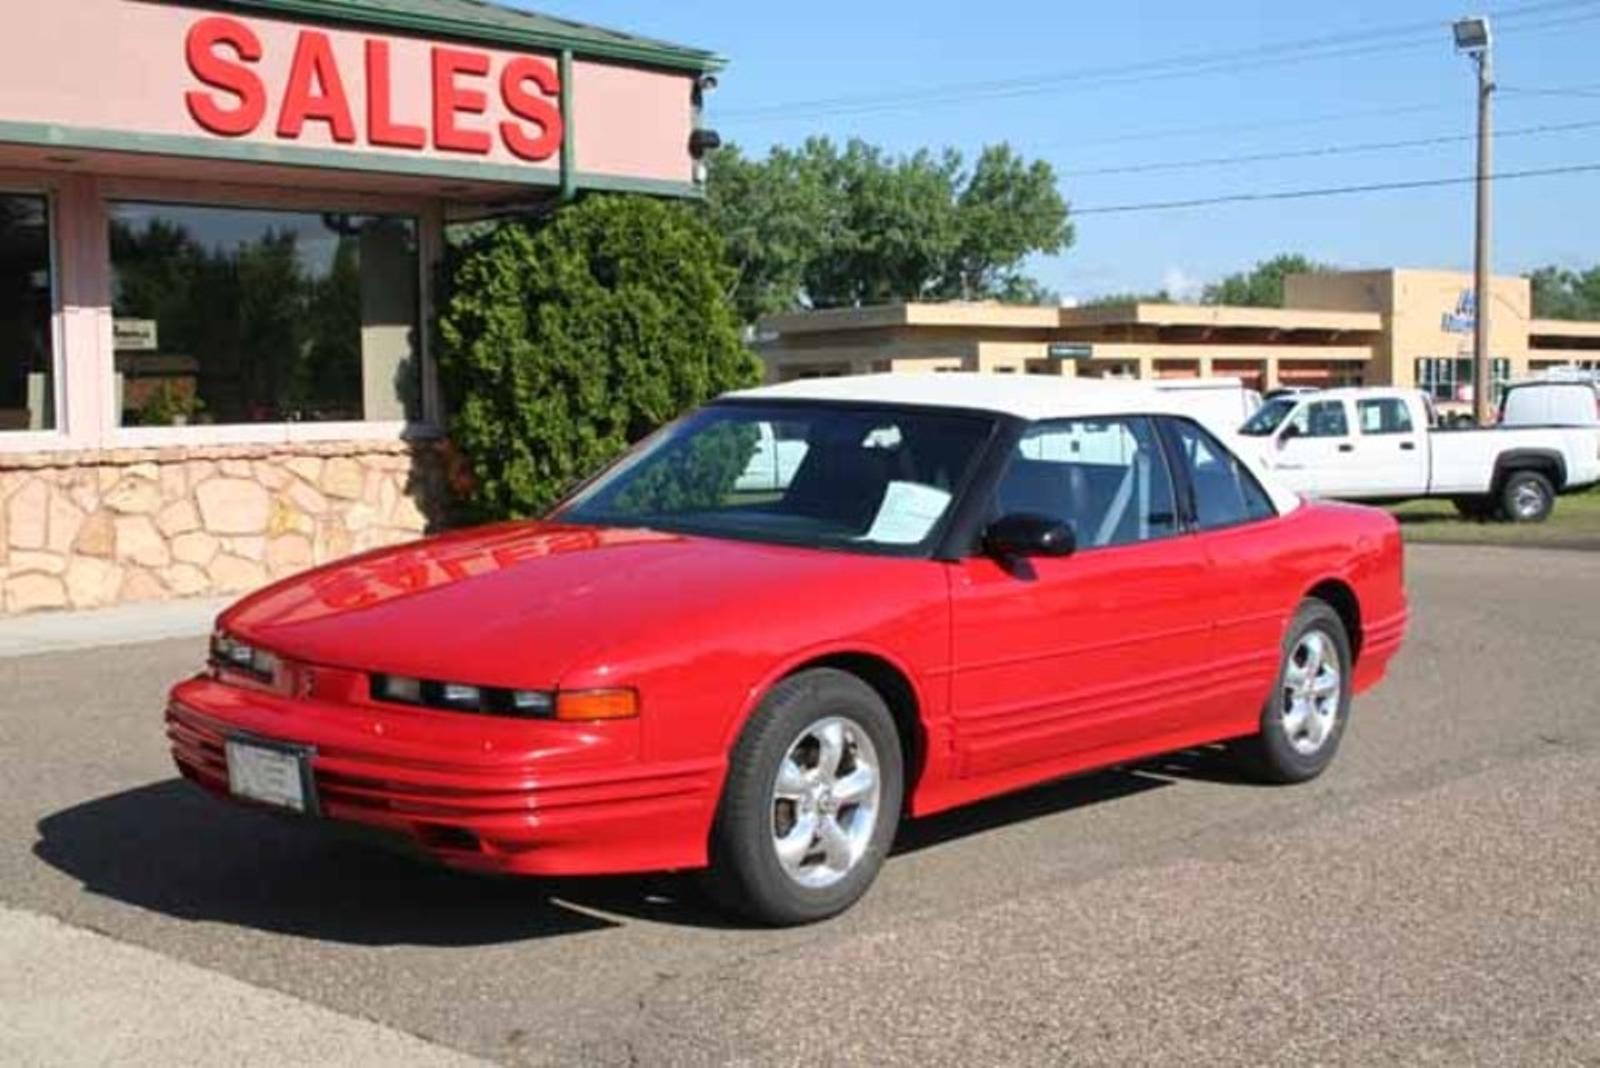 1992 oldsmobile cutlass supreme glendive mt glendive sales